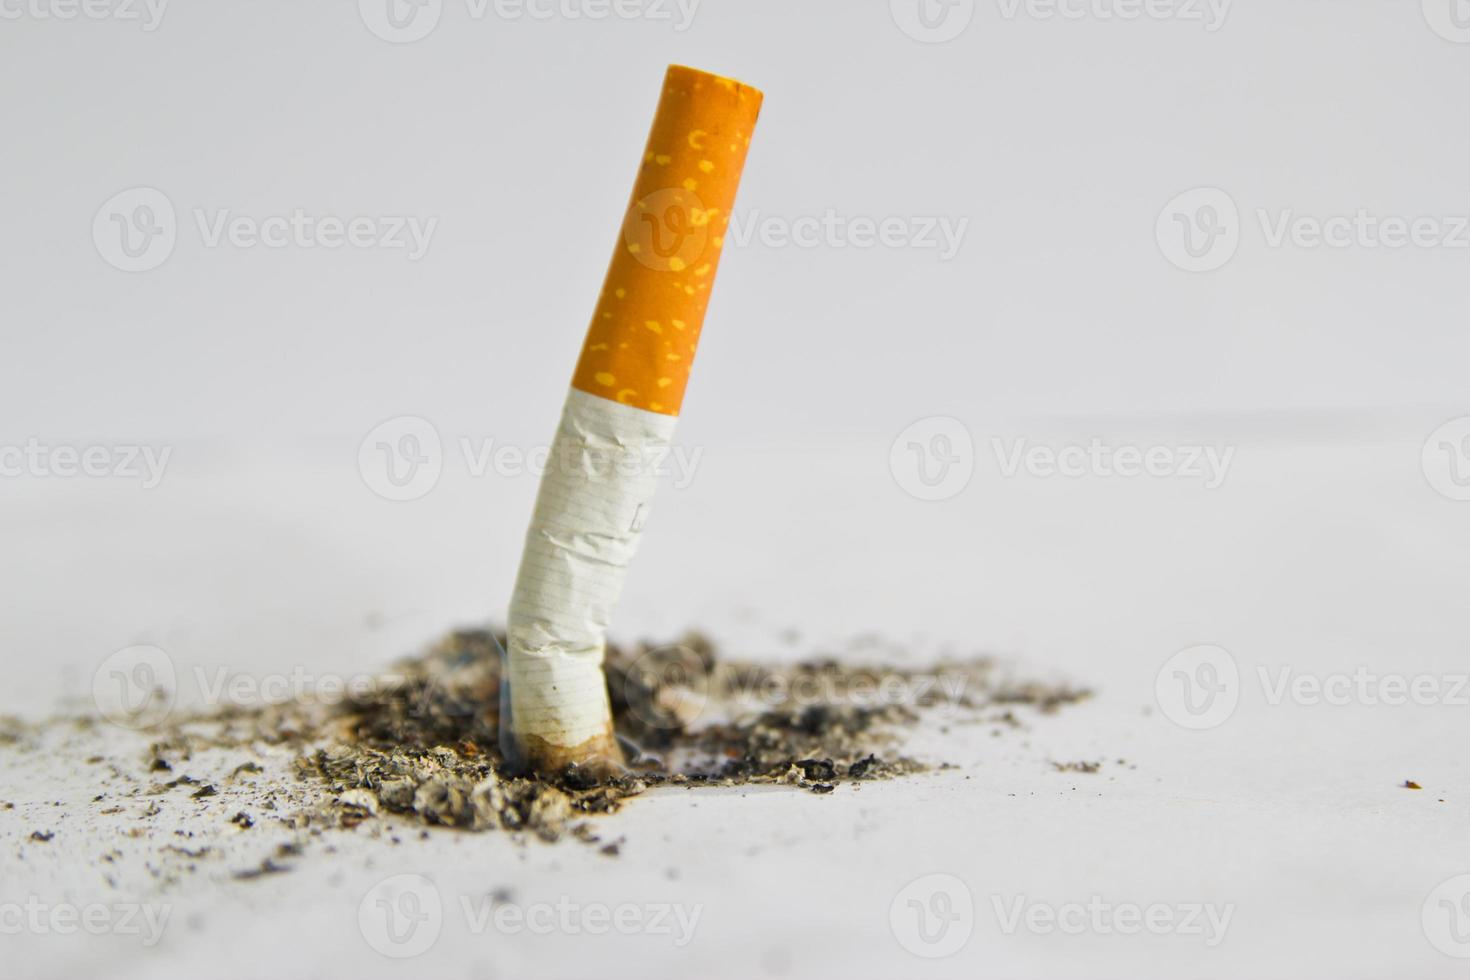 konsumerade cigaretter på vit bakgrund foto